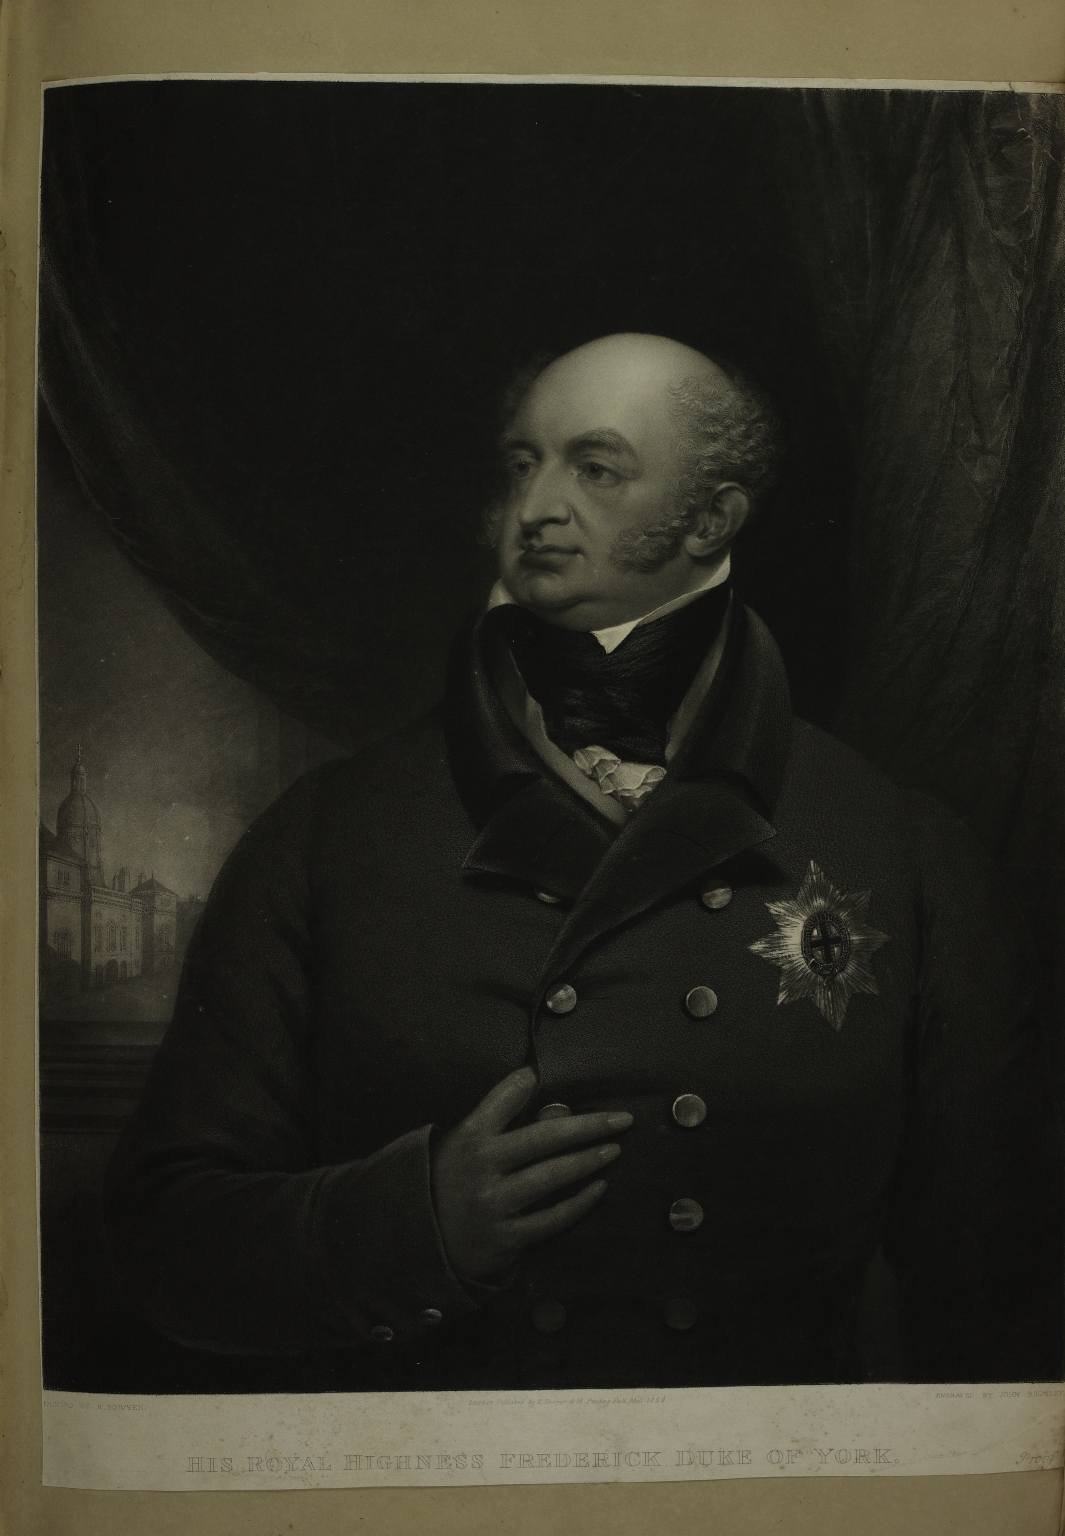 His Royal Highness Frederick Duke of York